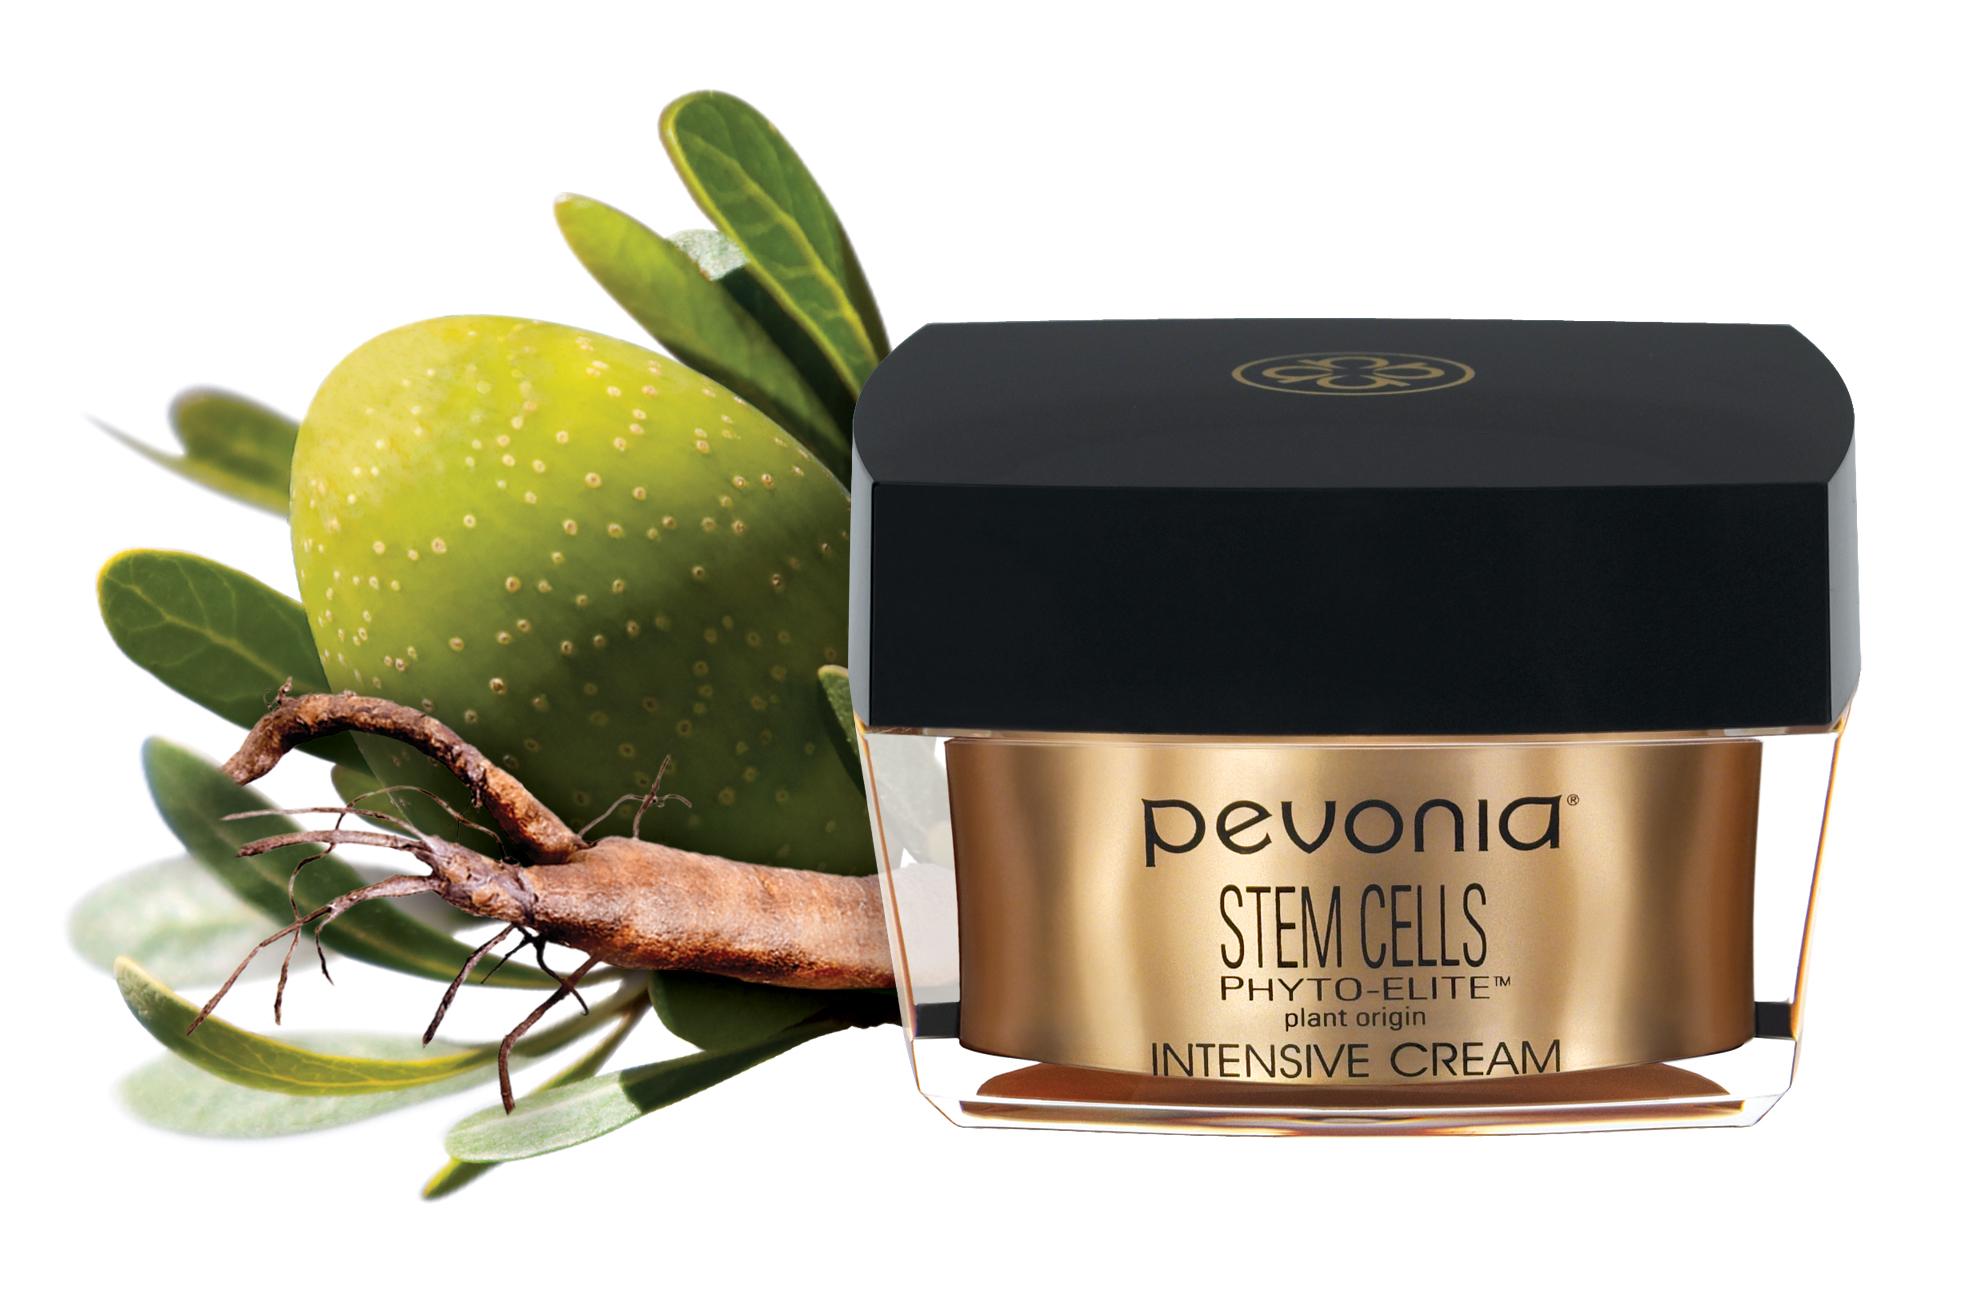 Kosmetika Pevonia Botanica